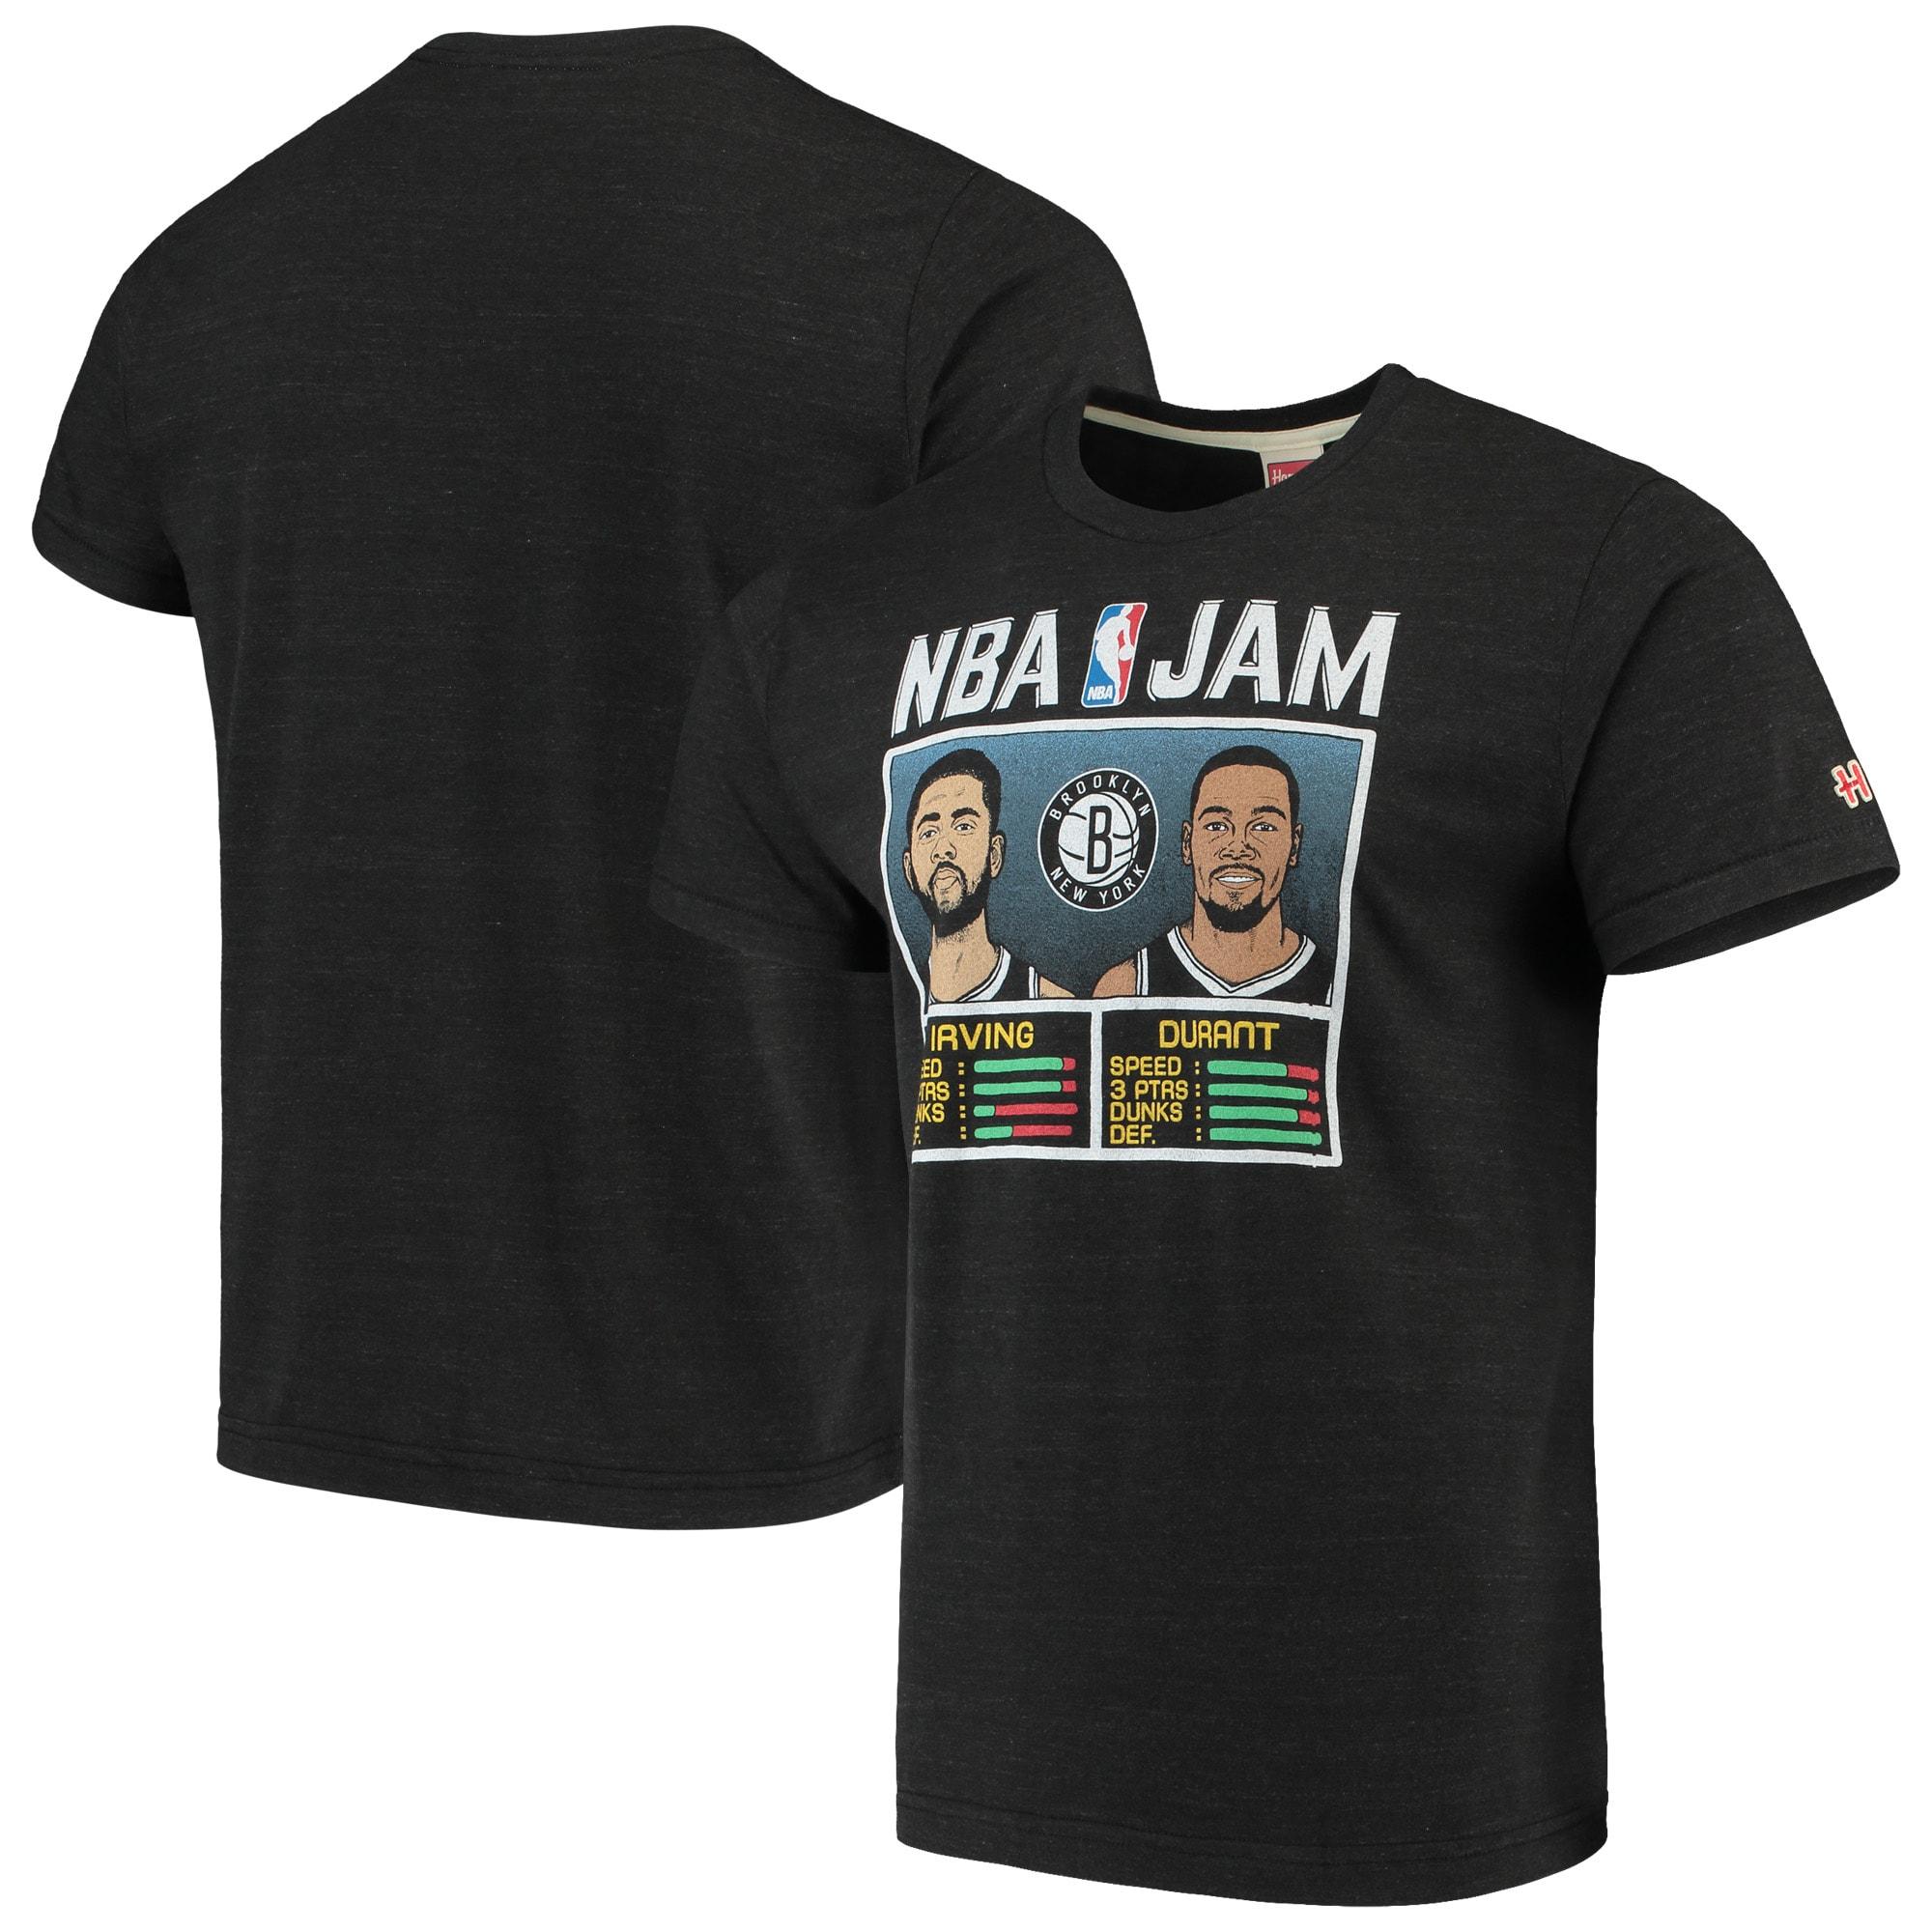 Kevin Durant & Kyrie Irving Brooklyn Nets NBA Jam T-Shirt - Charcoal